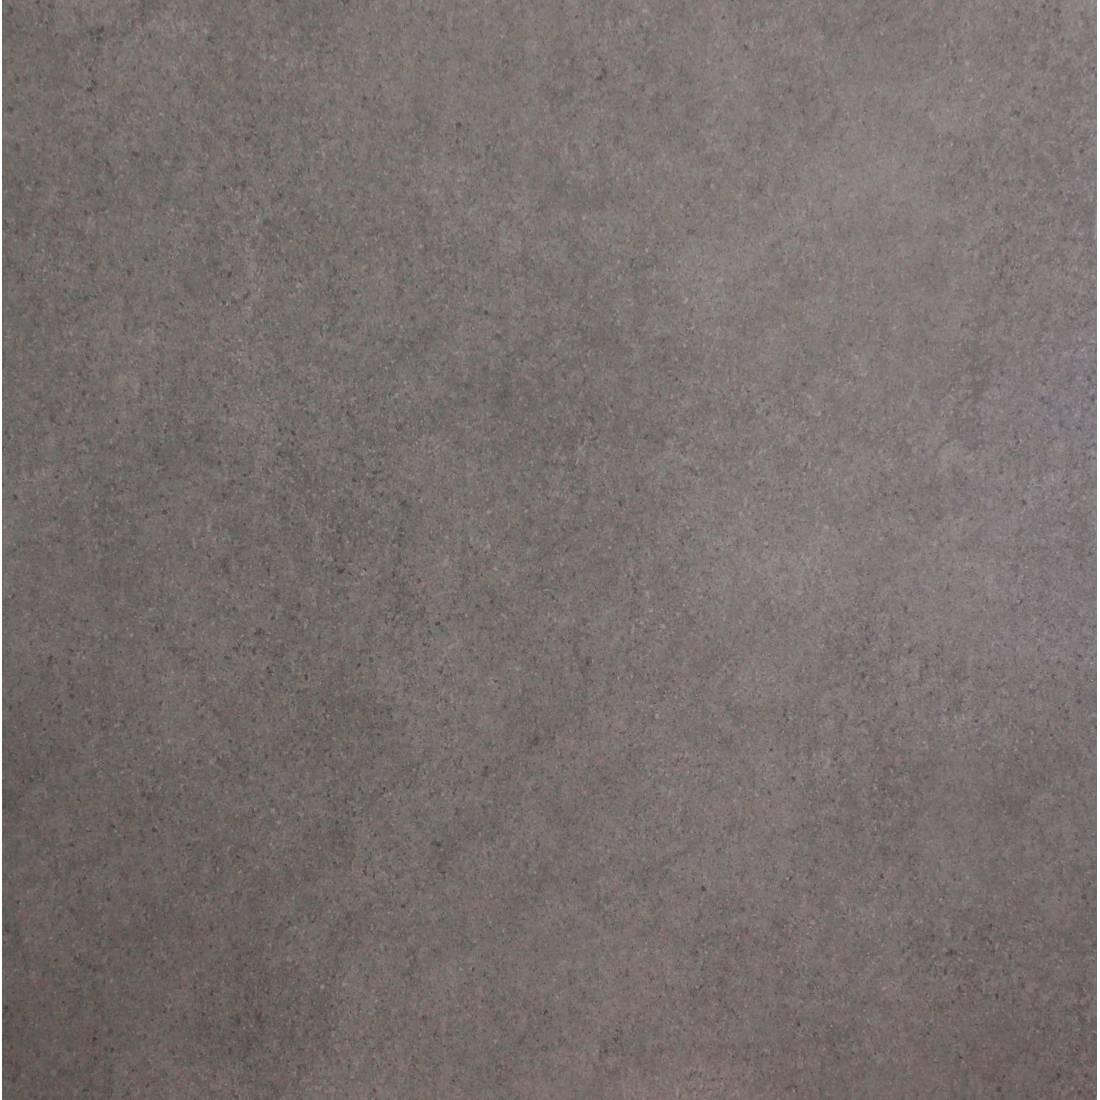 Solid 80x80 Grey R9 1